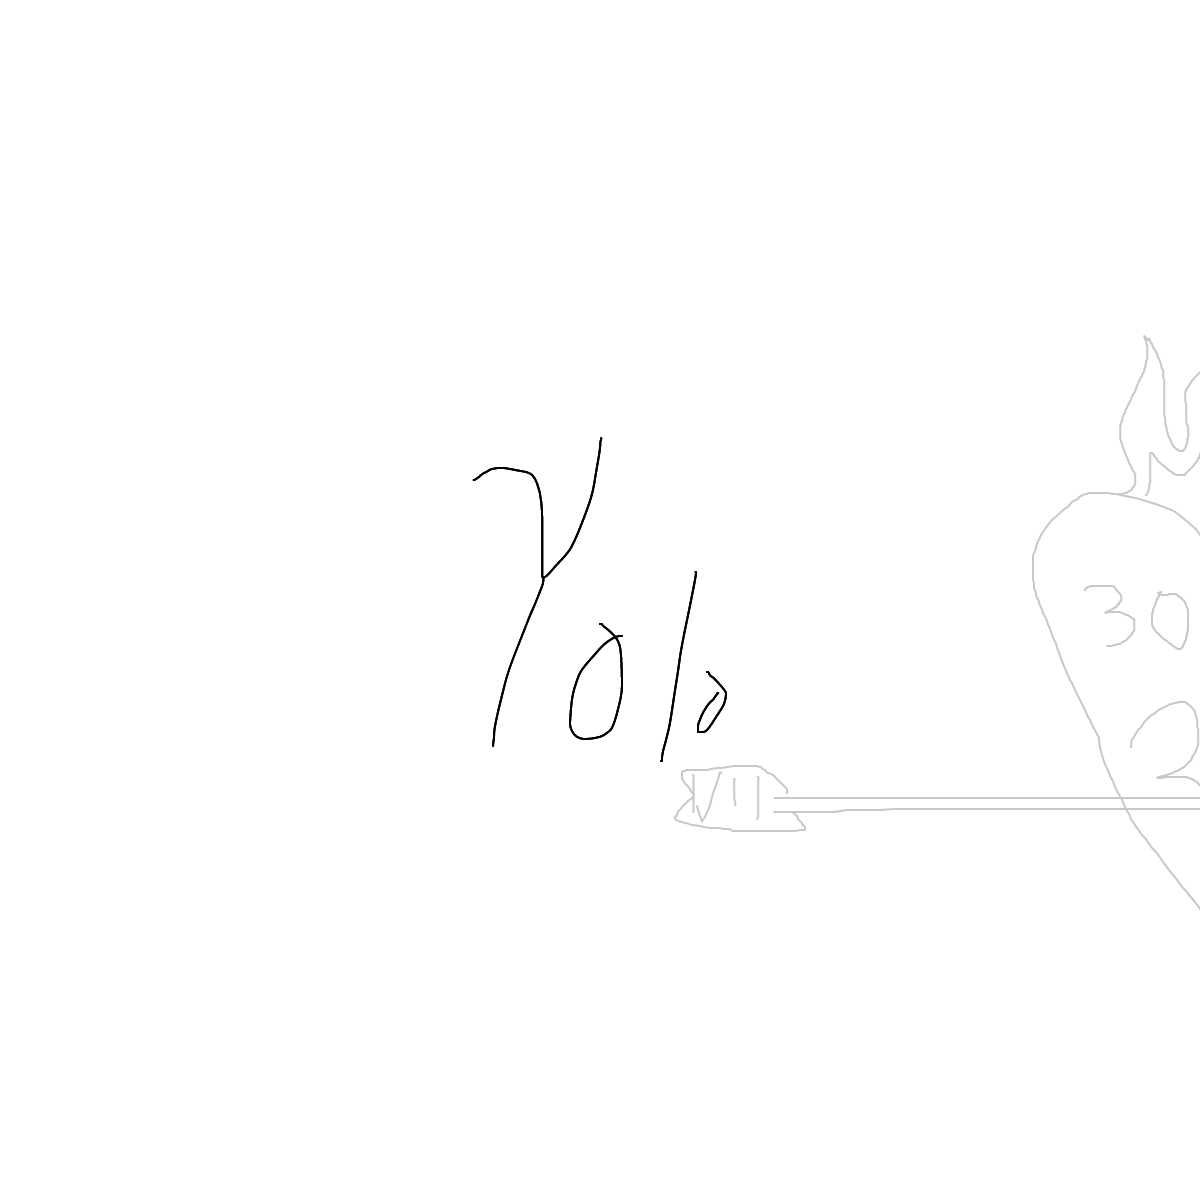 BAAAM drawing#24183 lat:64.1420440673828100lng: -21.9271564483642580